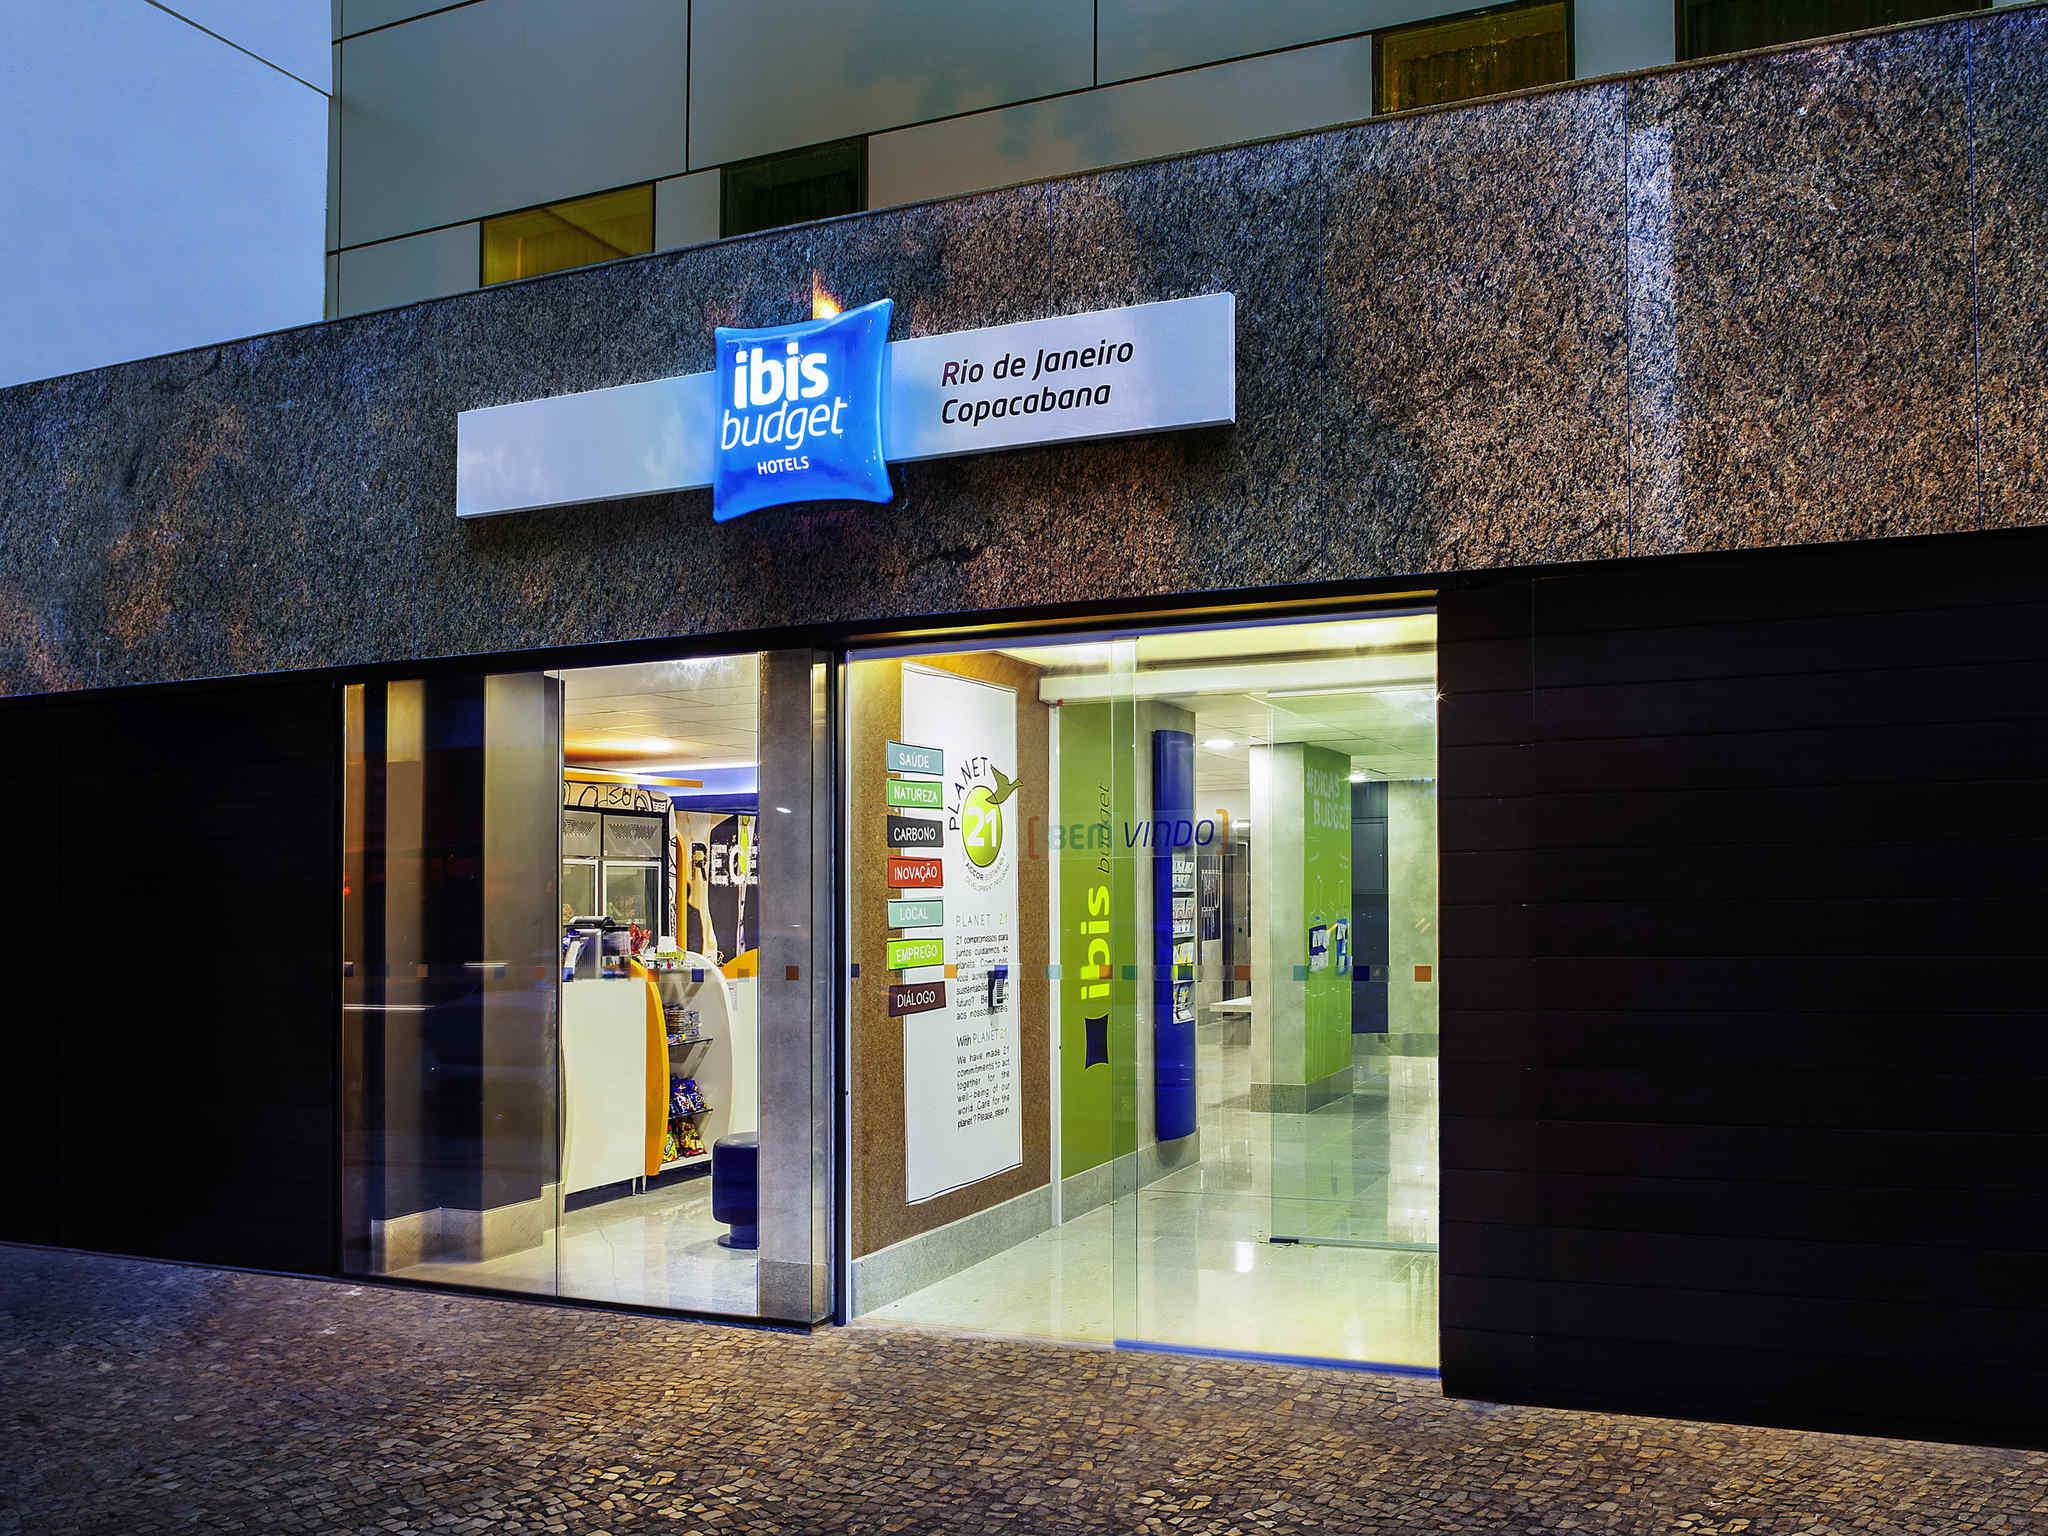 Hotel – ibis budget Rj Copacabana